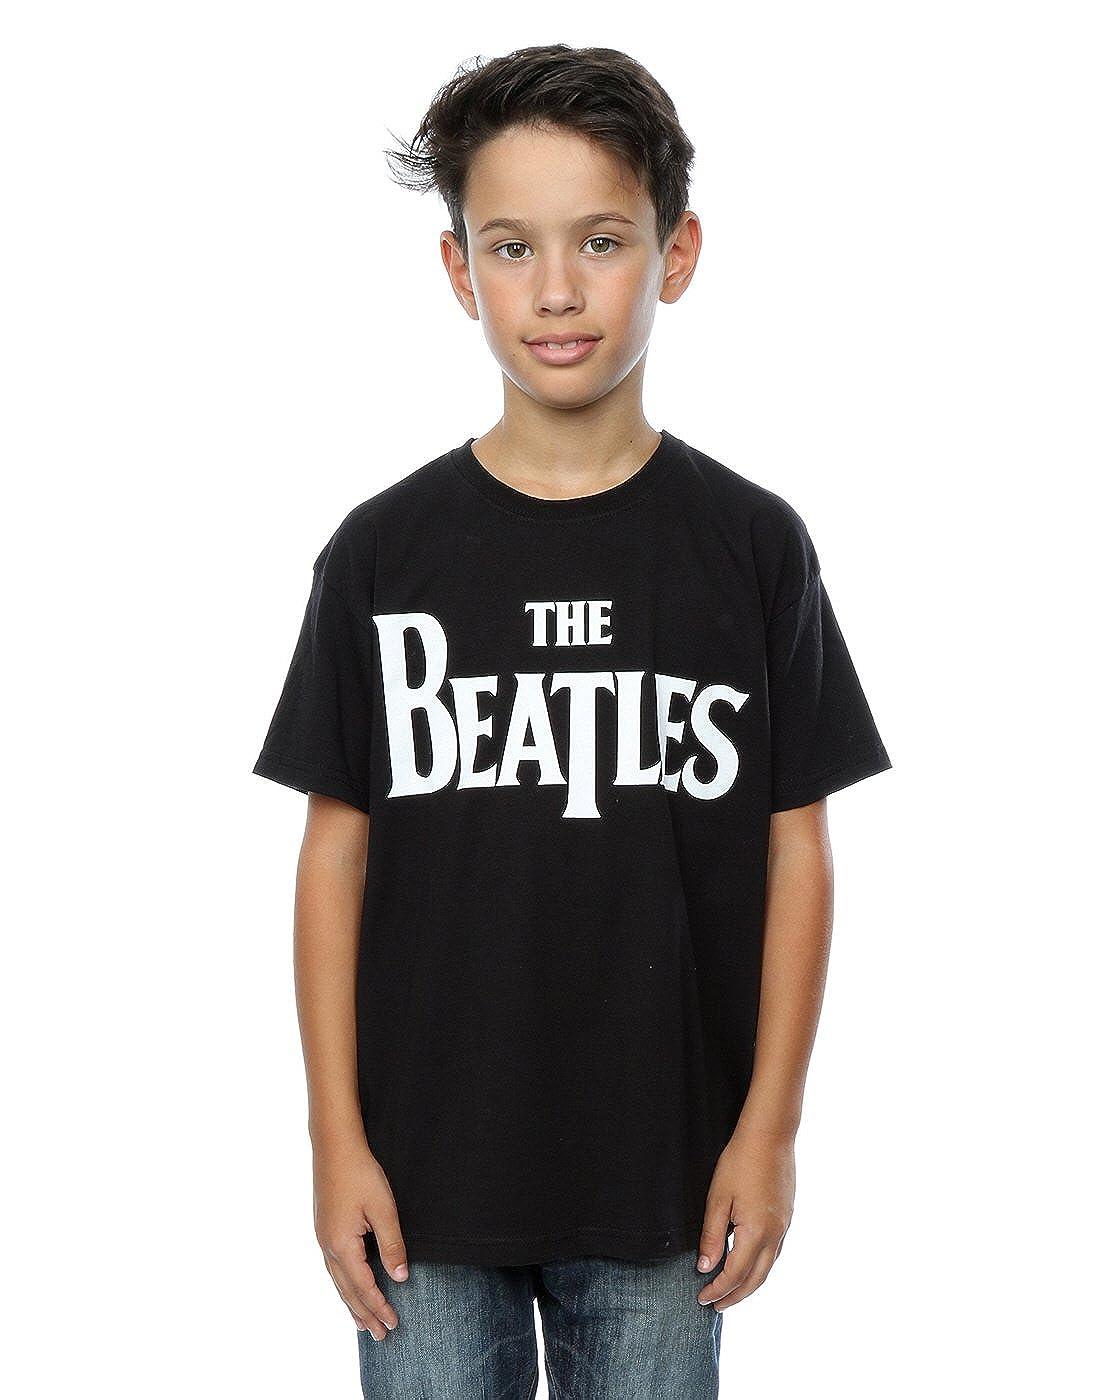 The Beatles Boys Drop T Logo T-Shirt 9-11 Years Black Absolute Cult